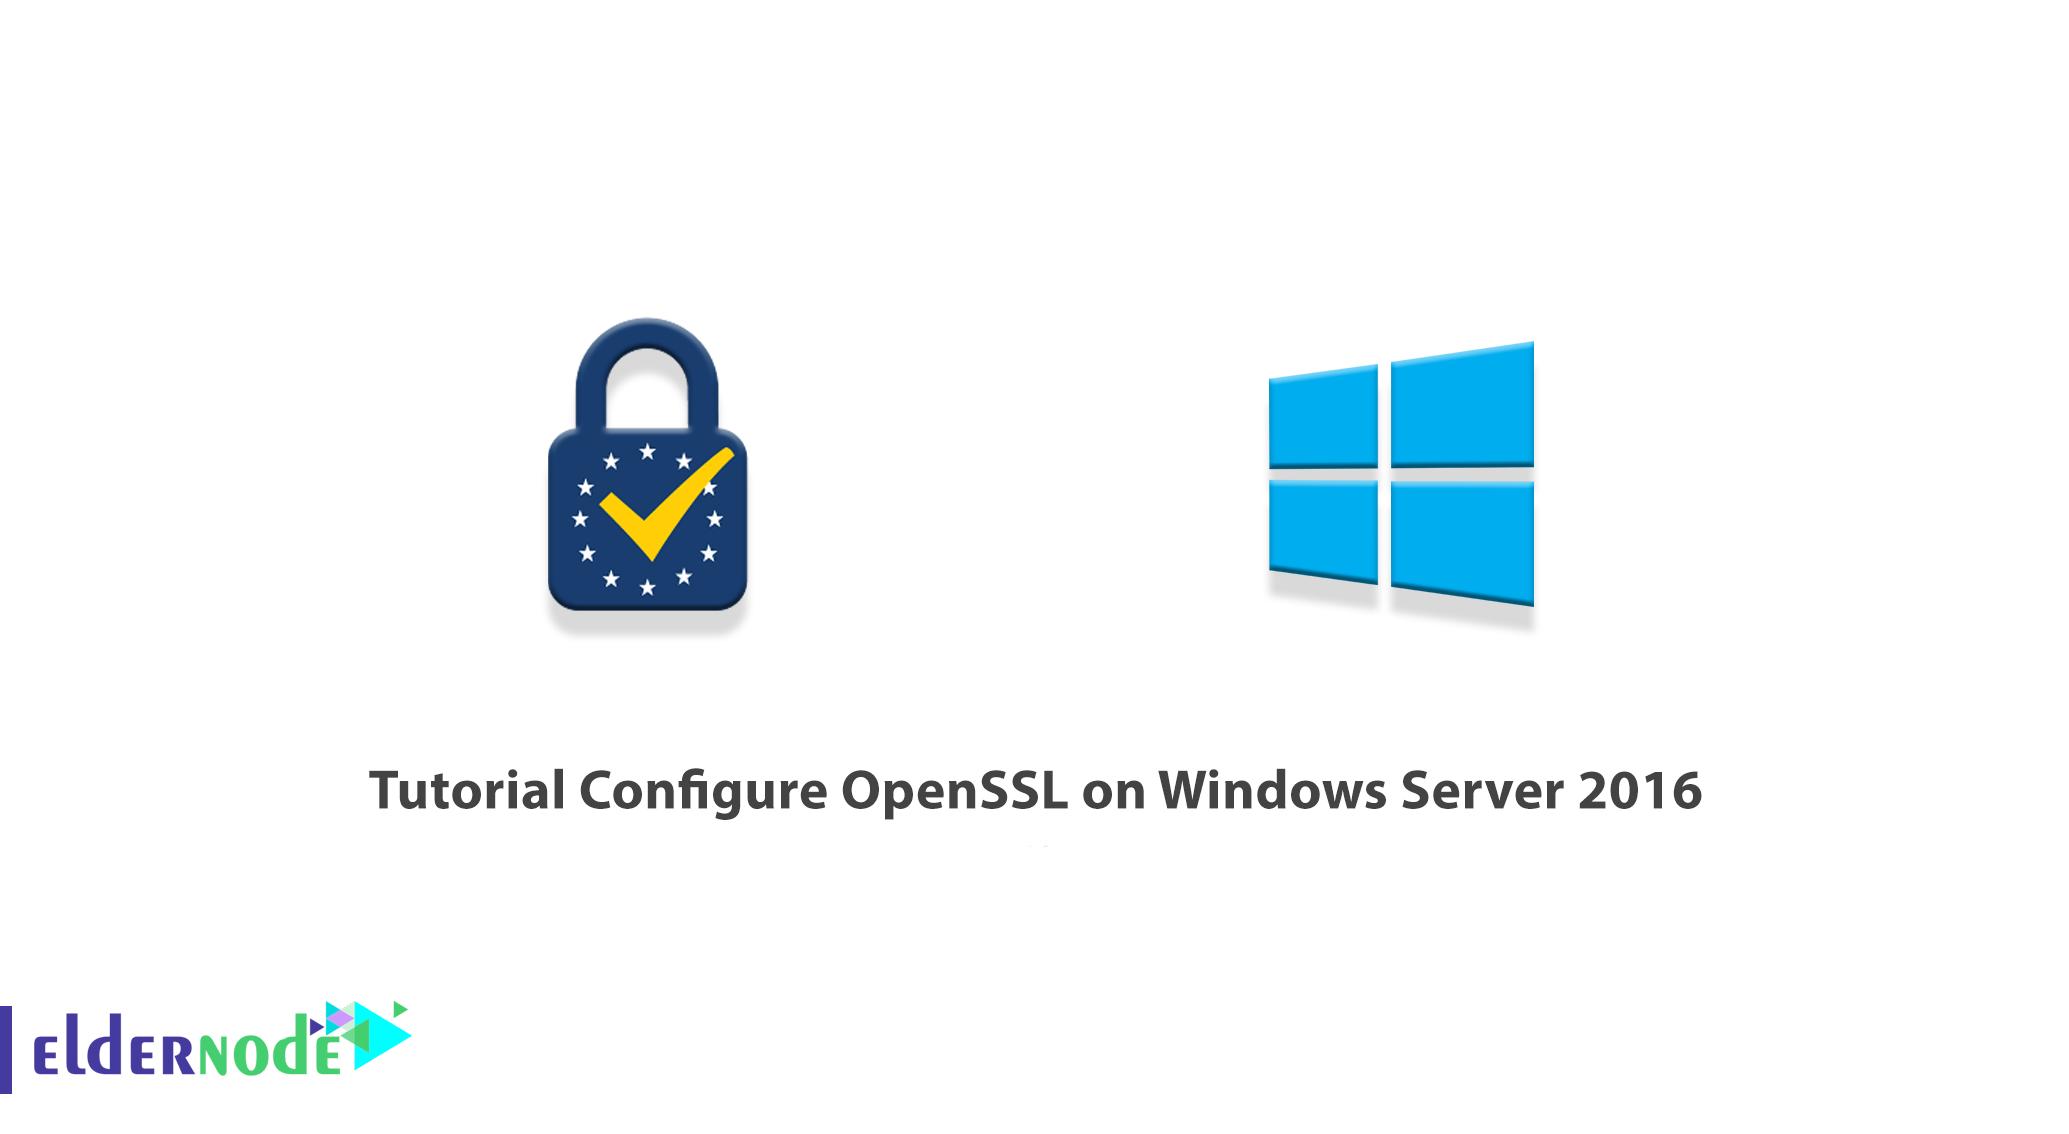 Tutorial Configure OpenSSL on Windows Server 2016